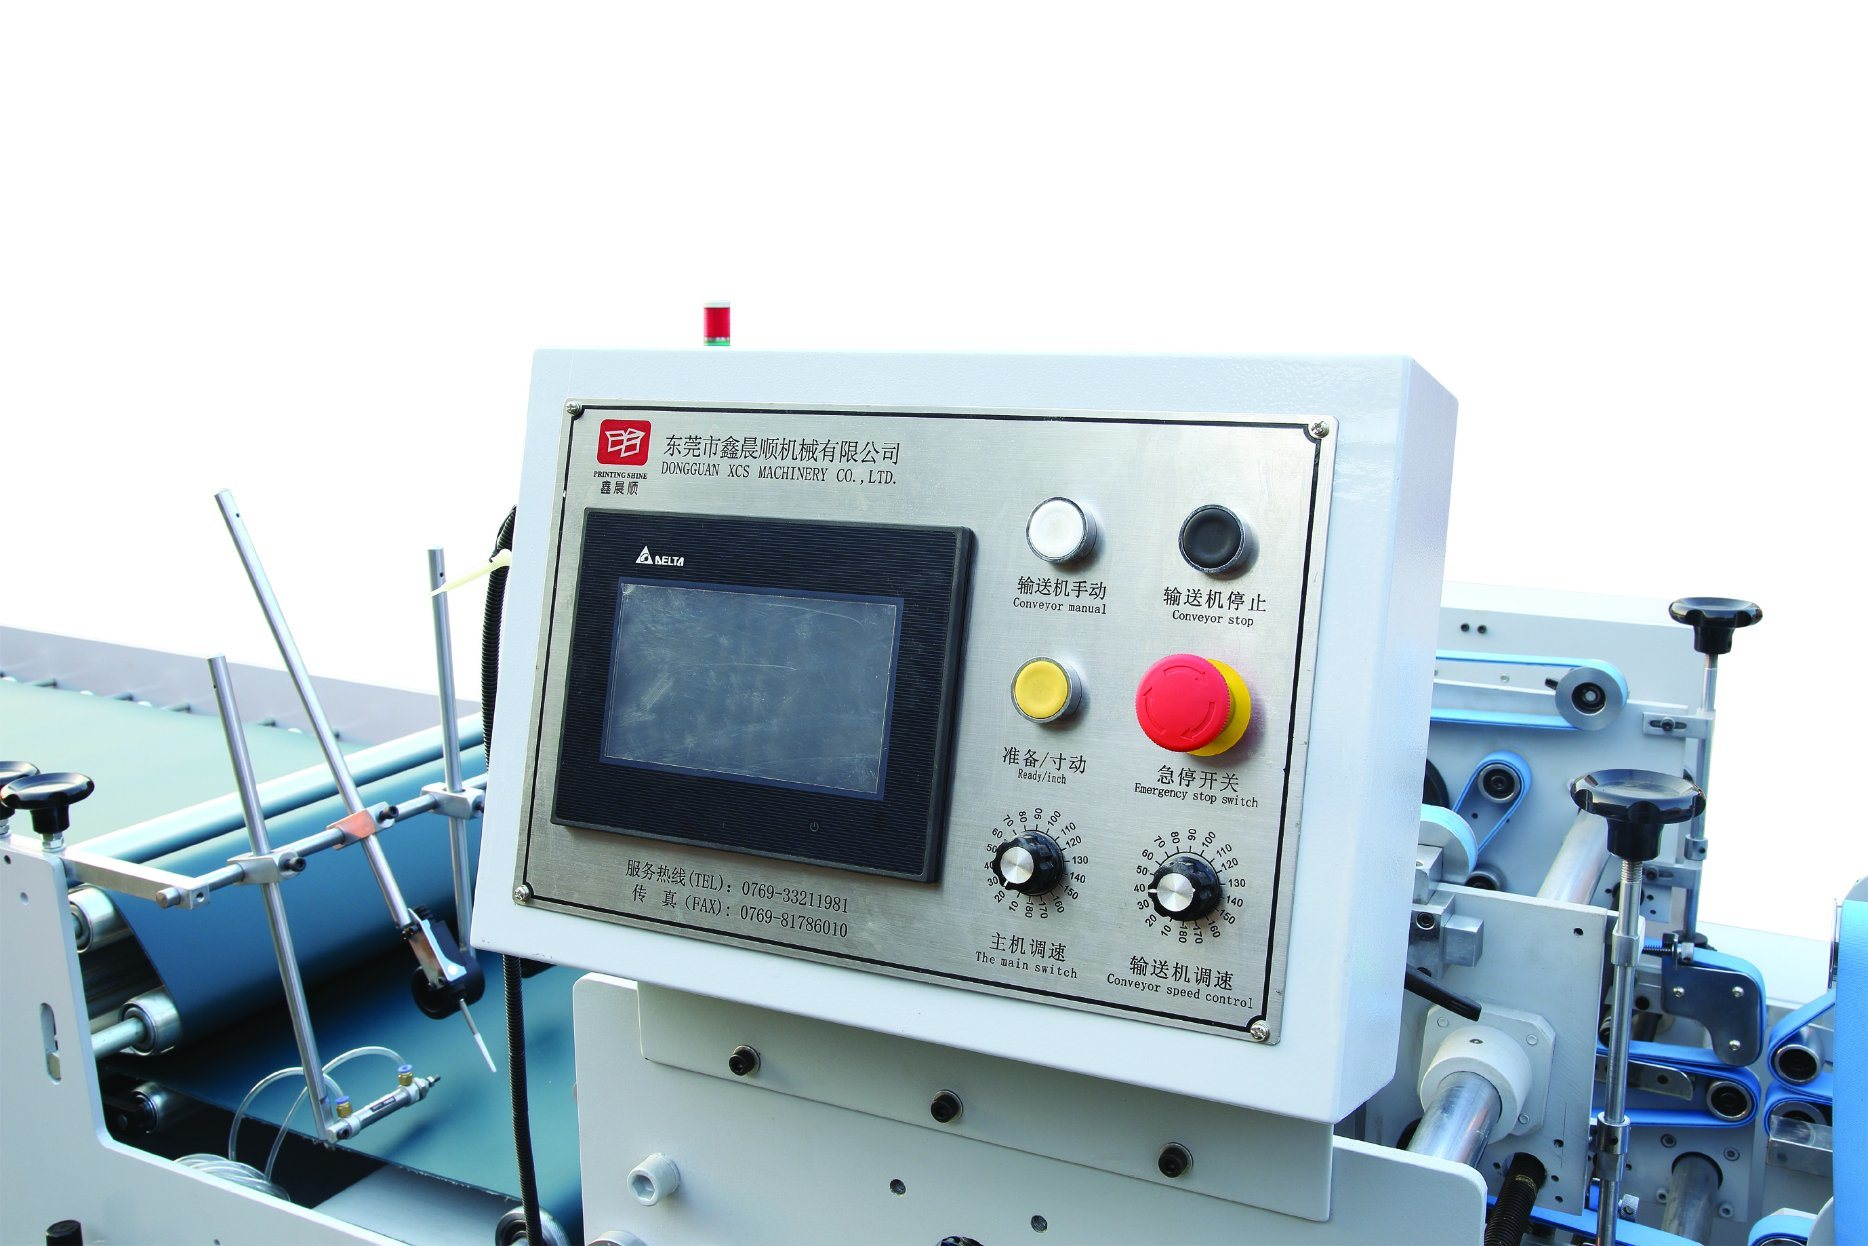 Xcs-1100 High-End and Classy Folder Gluer Machine